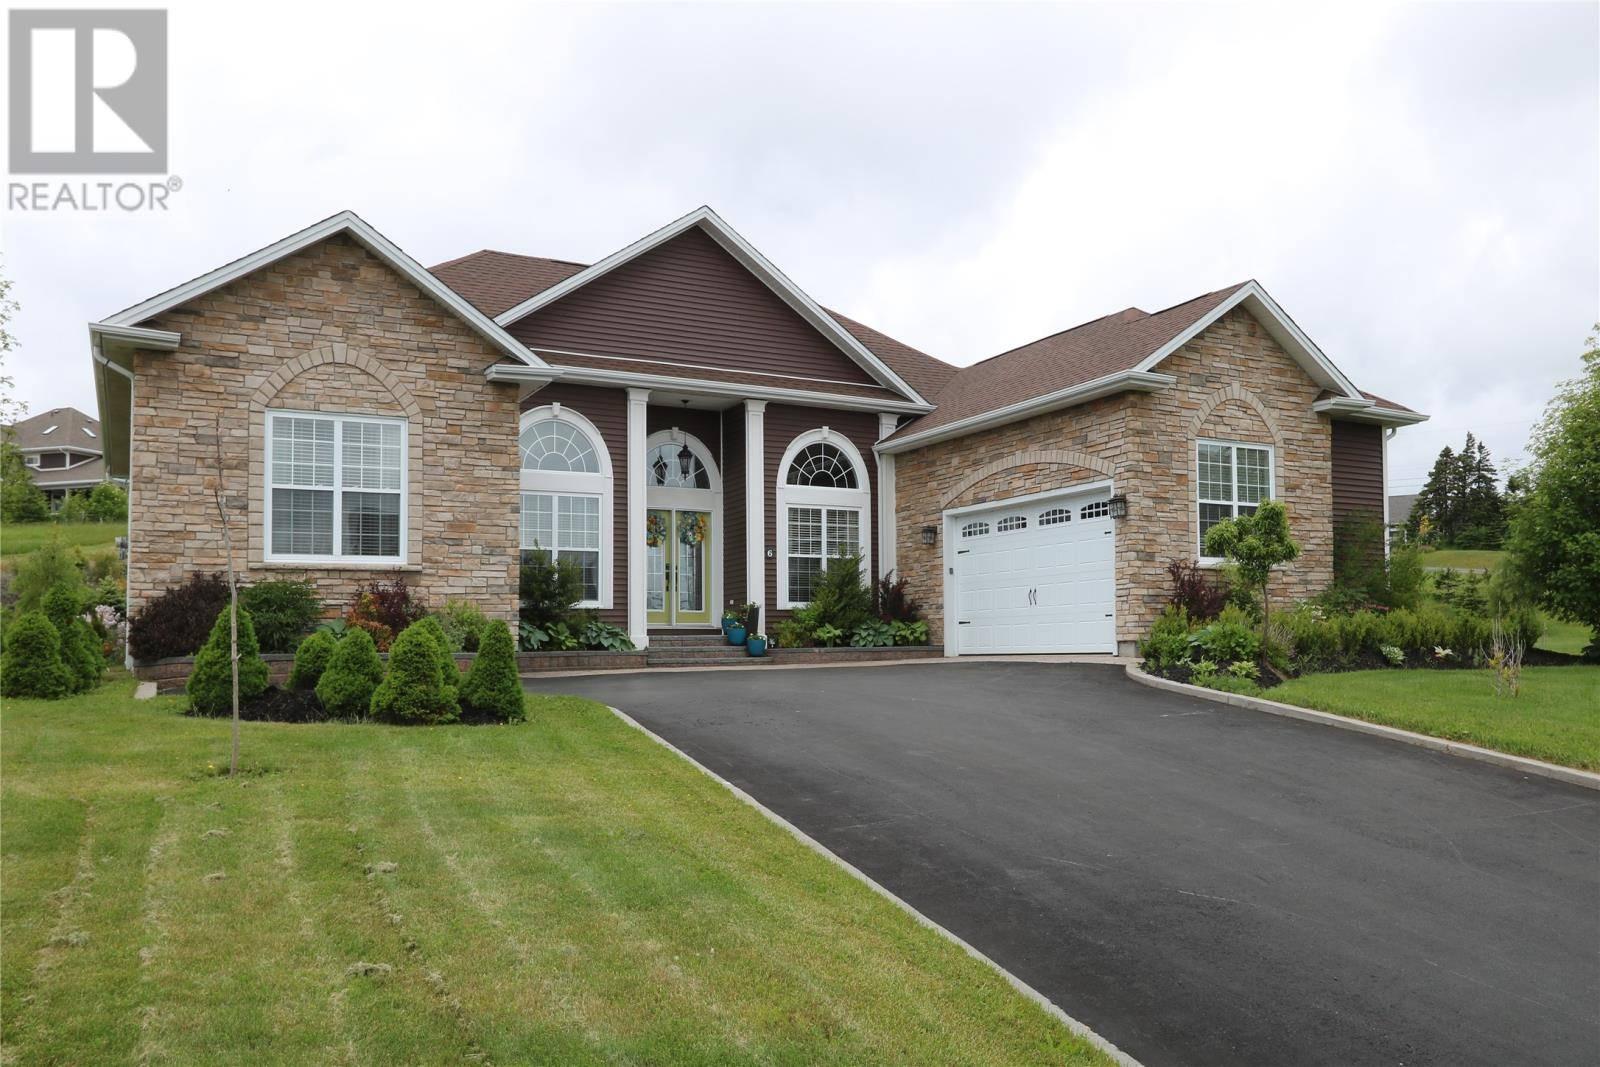 House for sale at 6 Ashkay Dr Logy Bay Newfoundland - MLS: 1209348